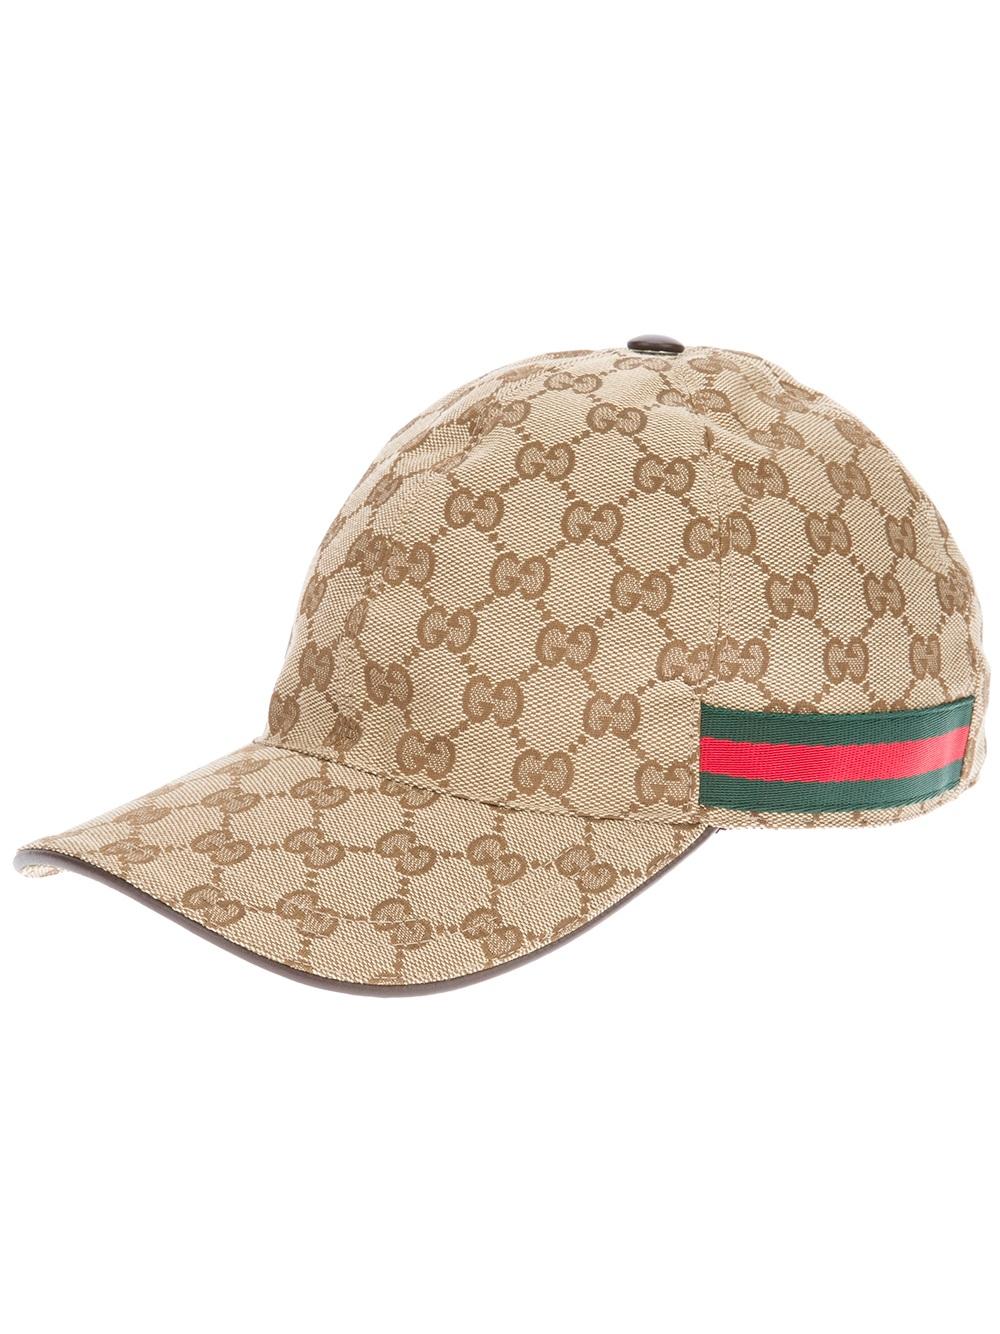 2e499653ac145 Gucci Unisex Emblem Print Cap in Natural for Men - Lyst